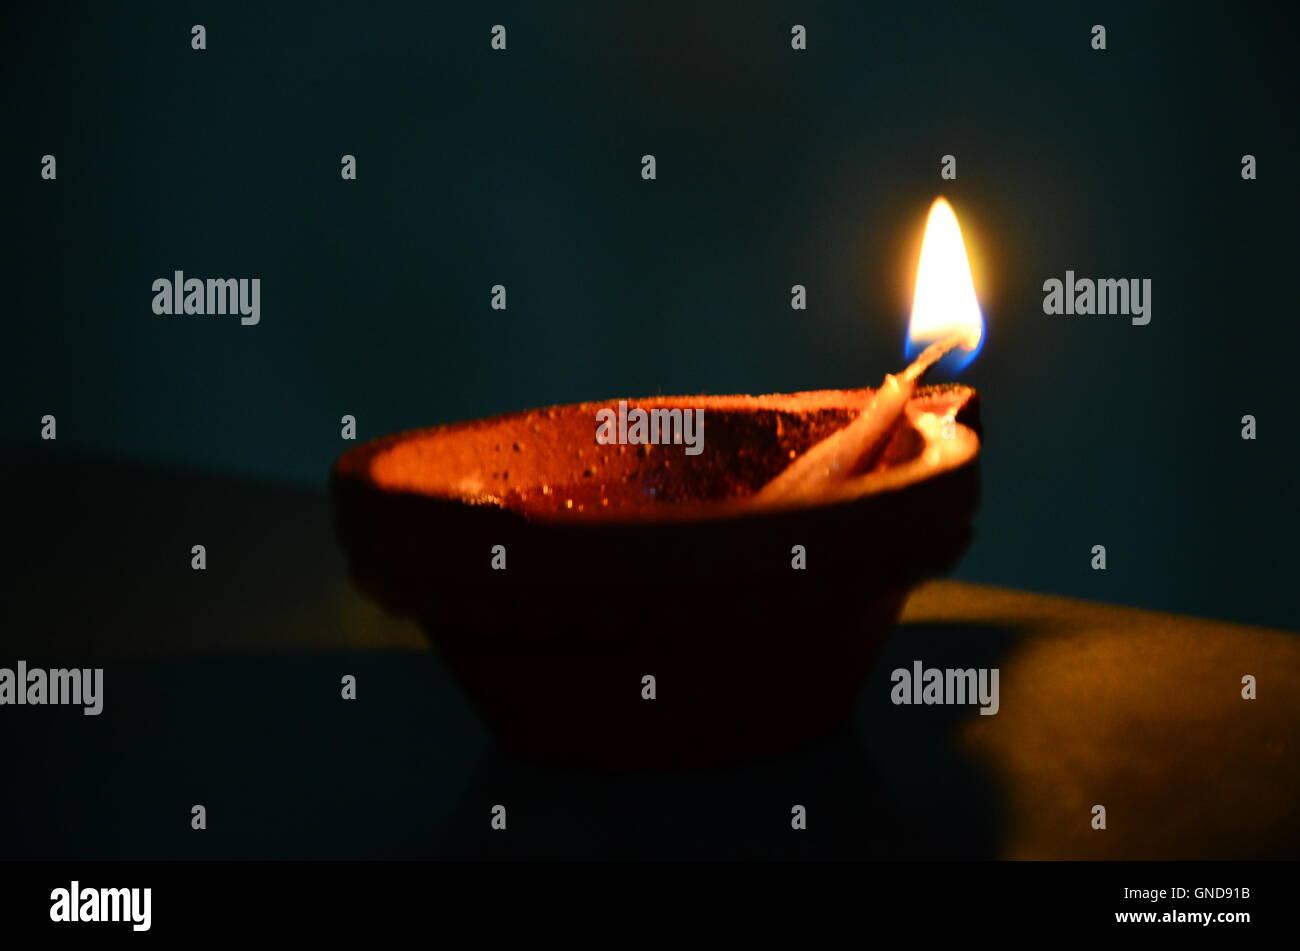 An earthen lamp. - Stock Image